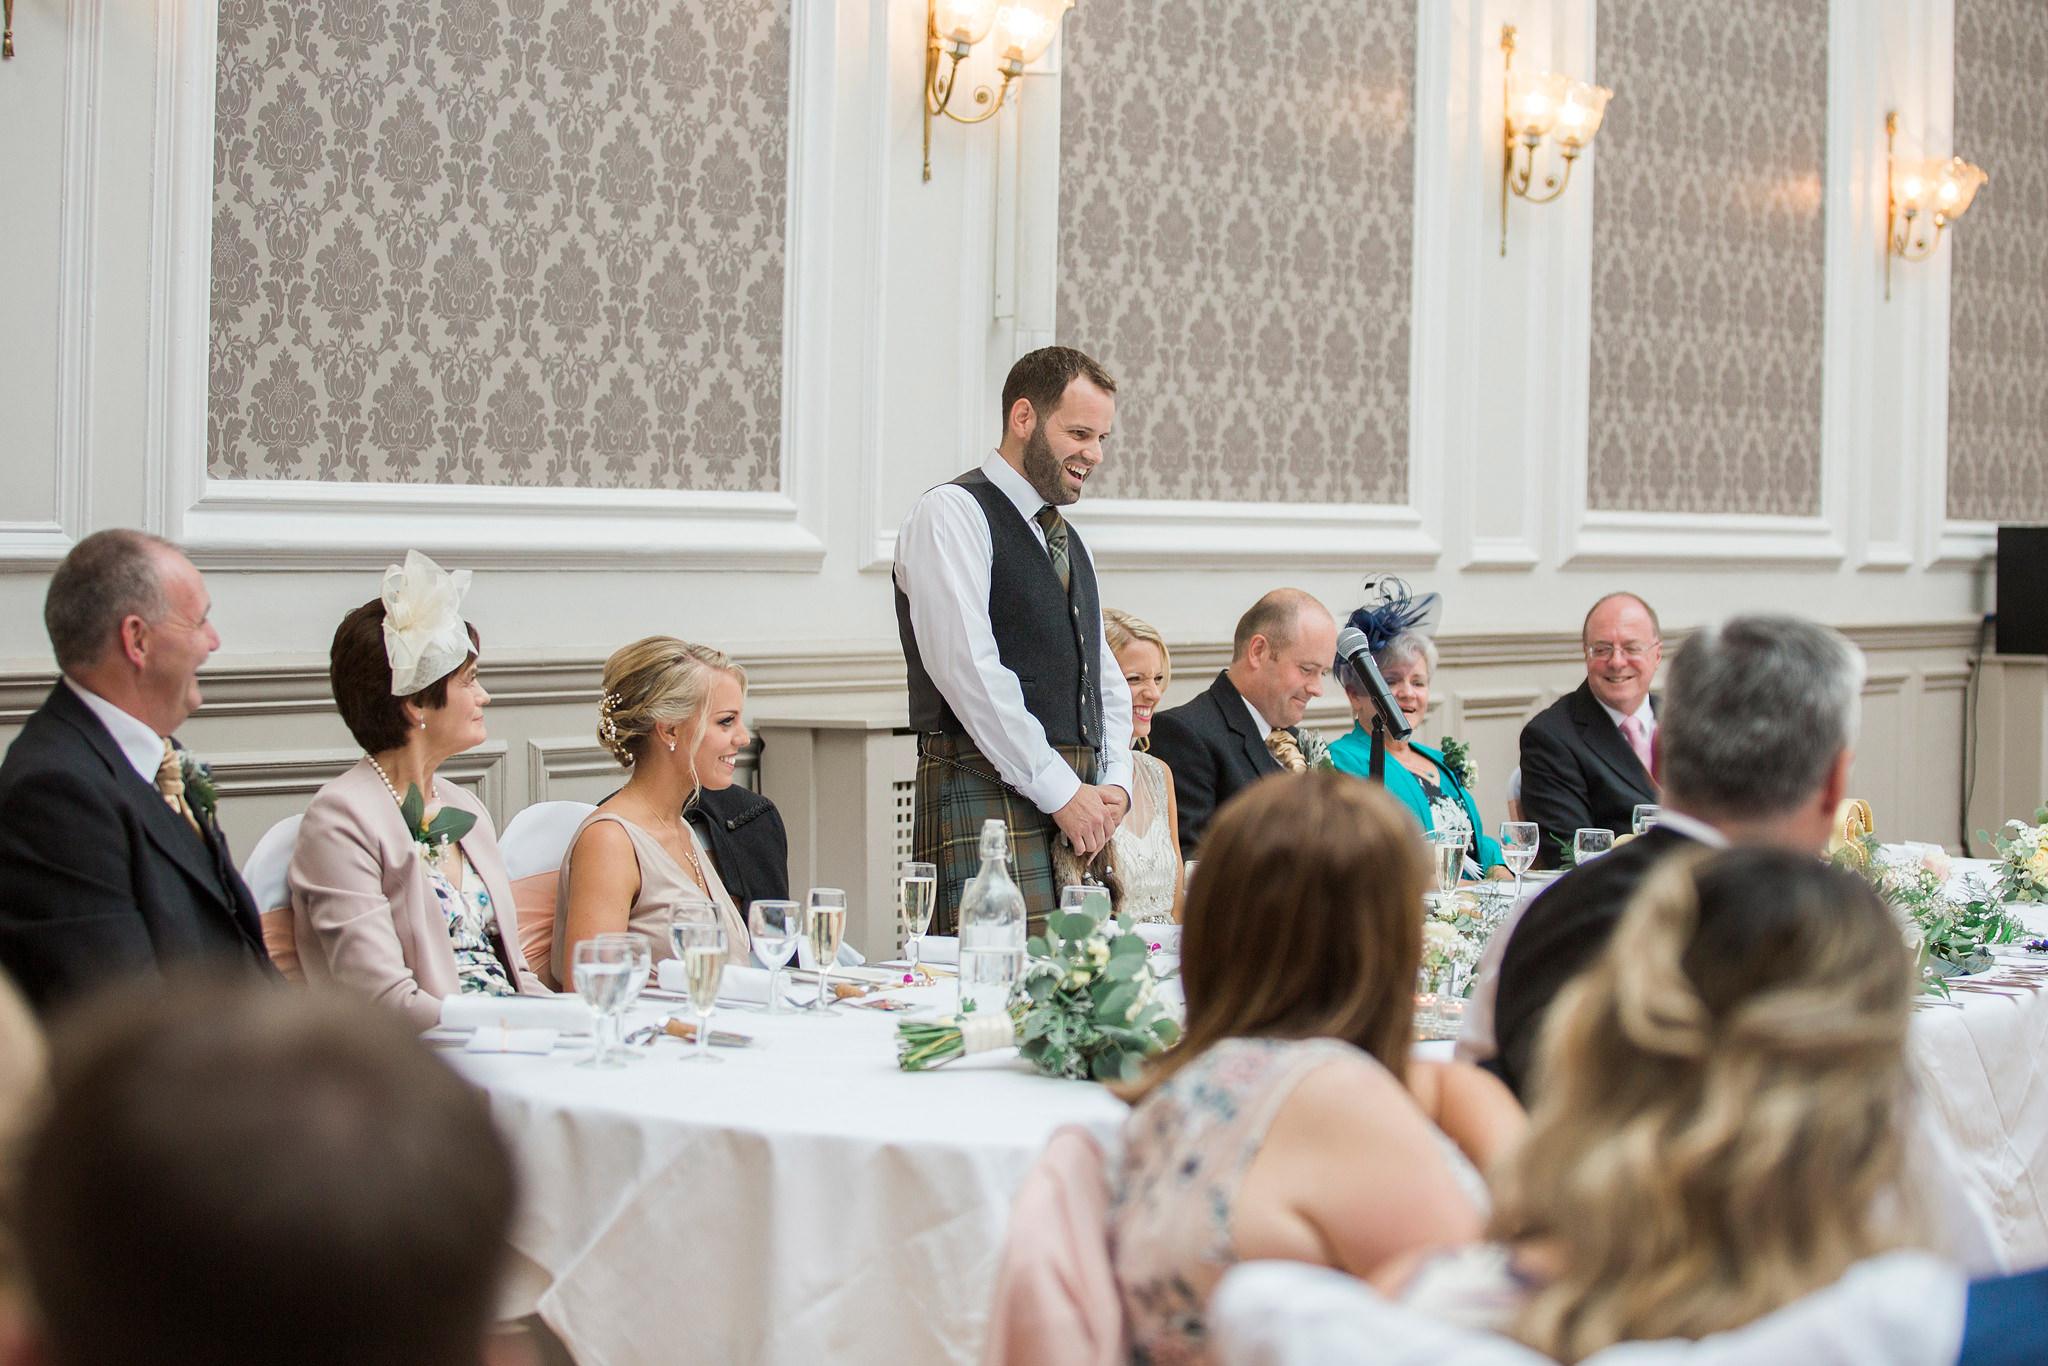 103-desination-wedding-photographer-scotland.jpg